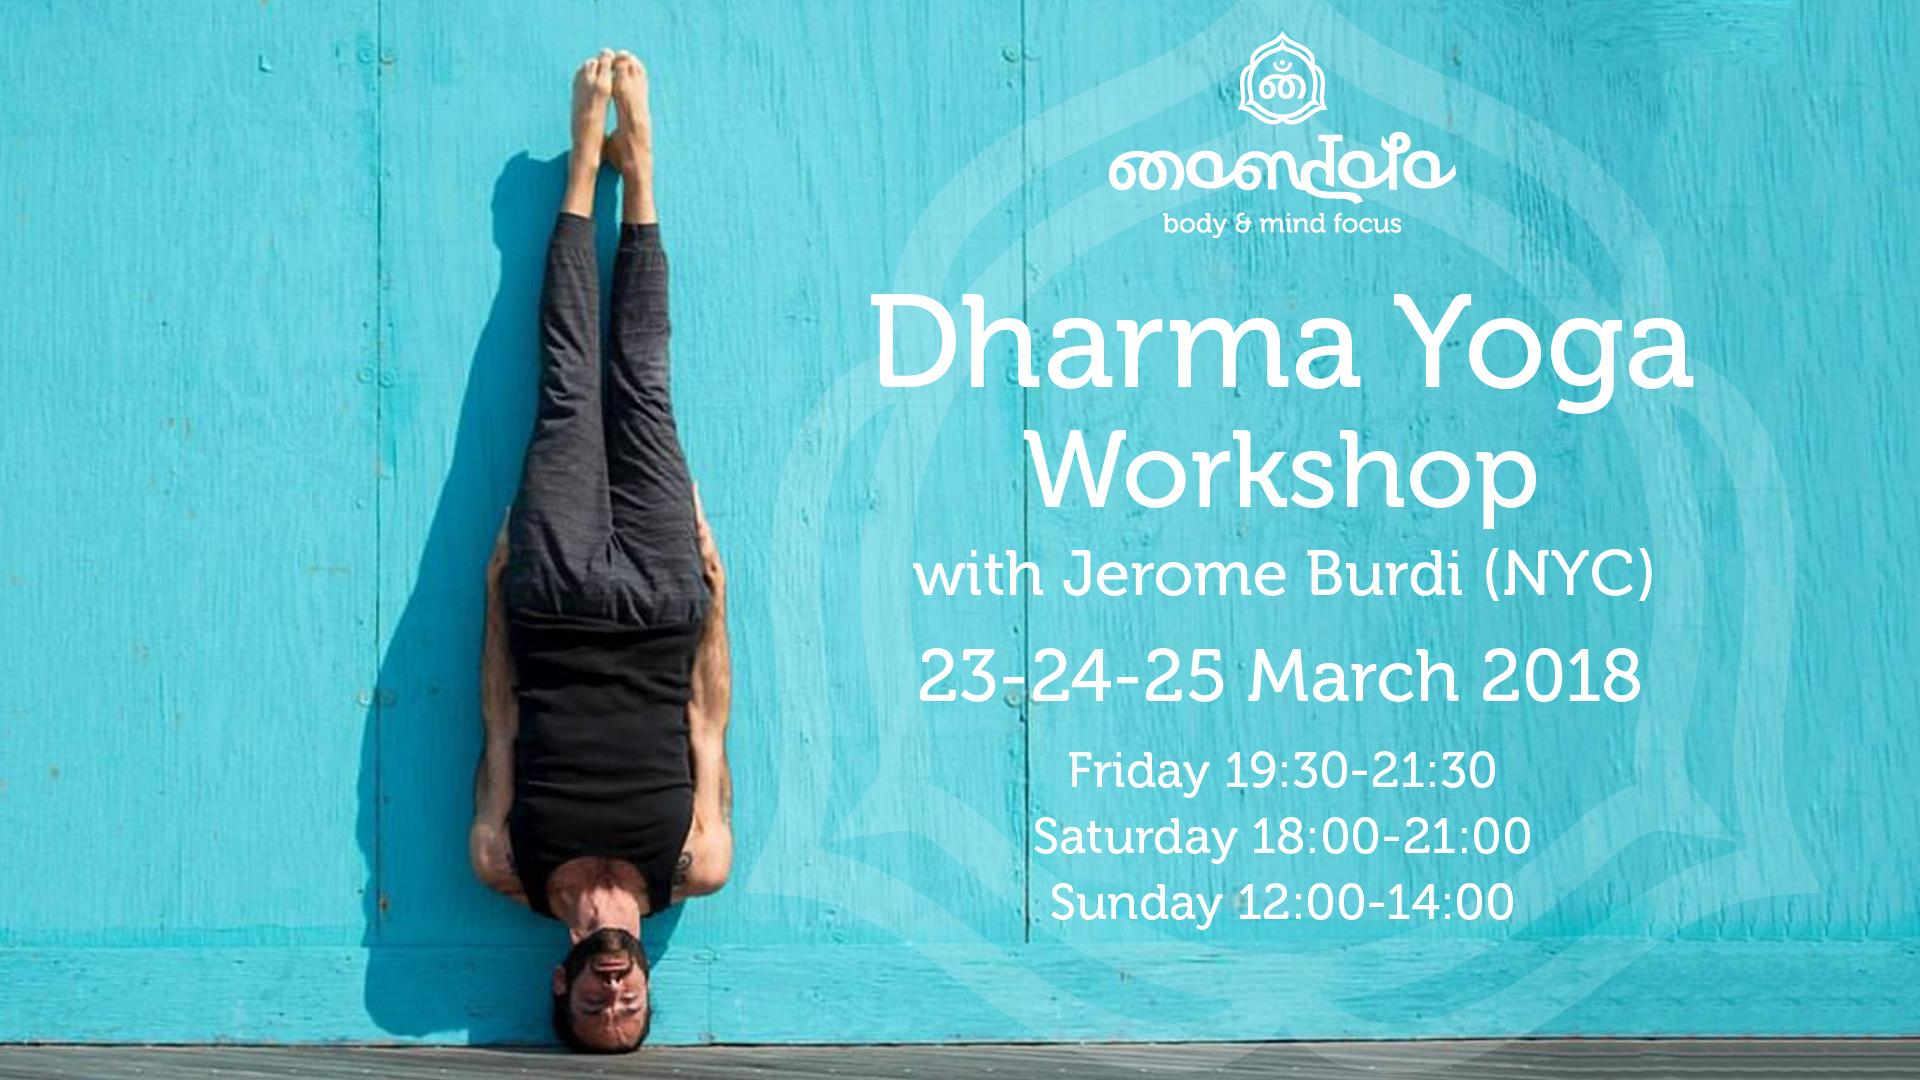 Dharma Yoga Workshop with Jerome Burdi (NYC)